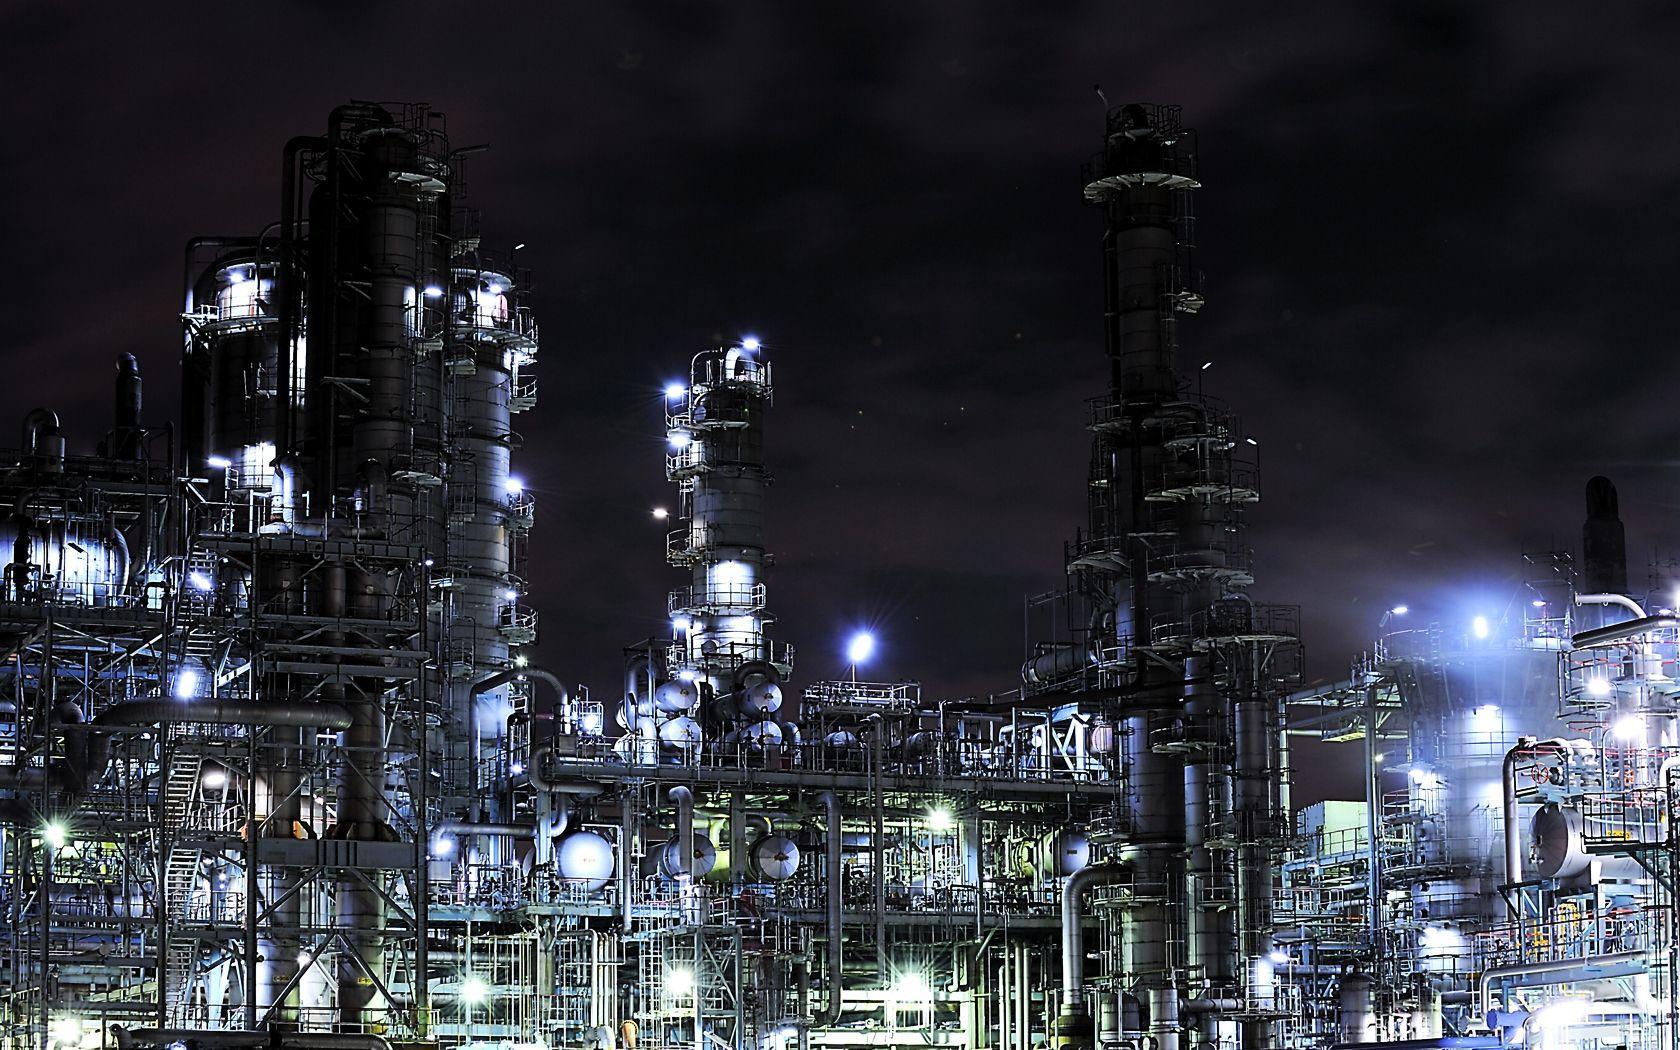 Industrial Machine Wallpapers